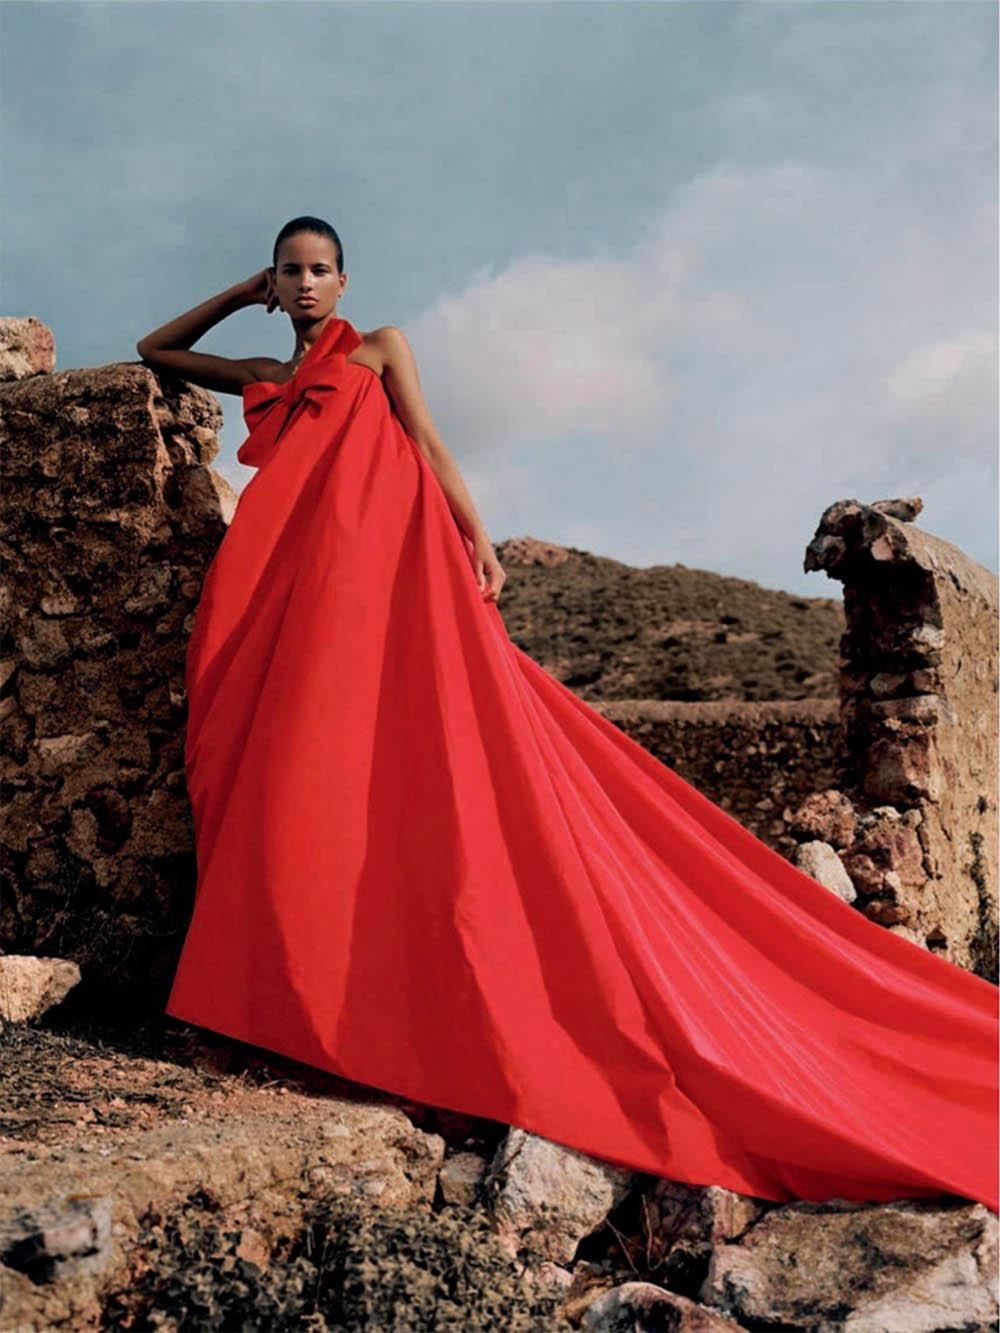 Litza Veloz by Anya Holdstock for Vogue Spain February 2020